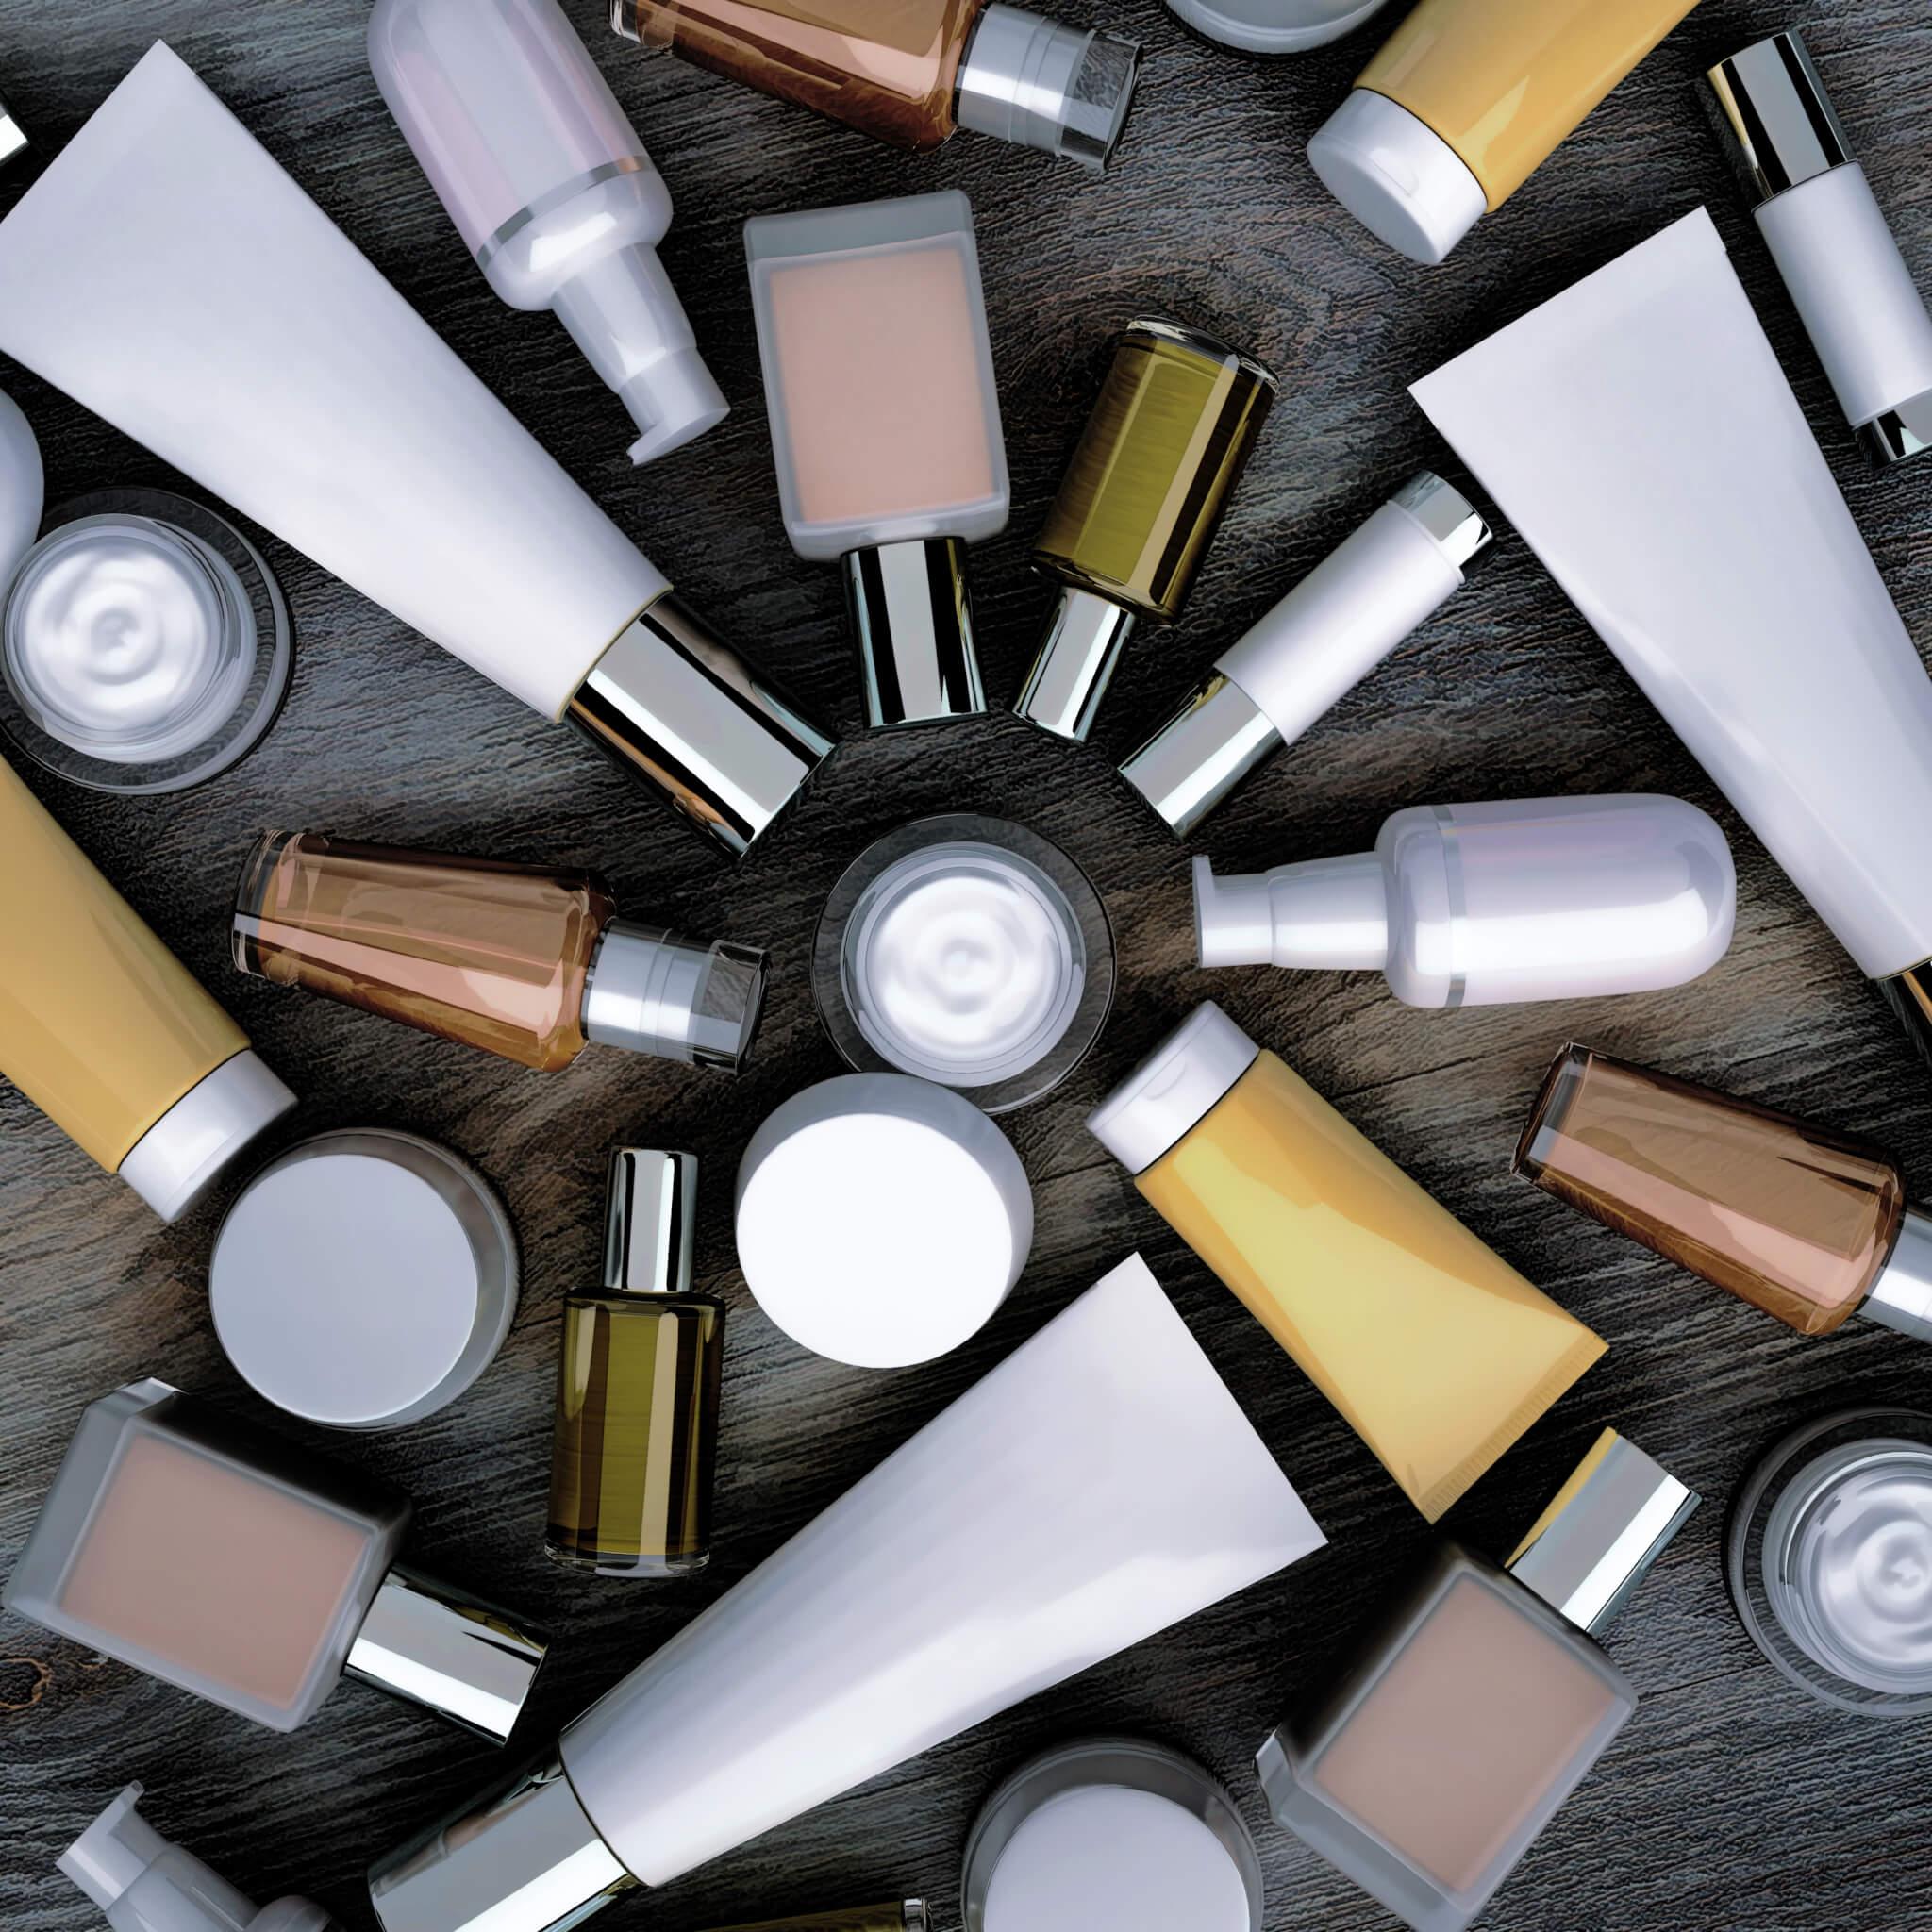 Traces impurities testing, cosmetic compliance, cosmetic Allergen screening, formaldehyde testing, restricted substances cosmetics, cosmetic compliance